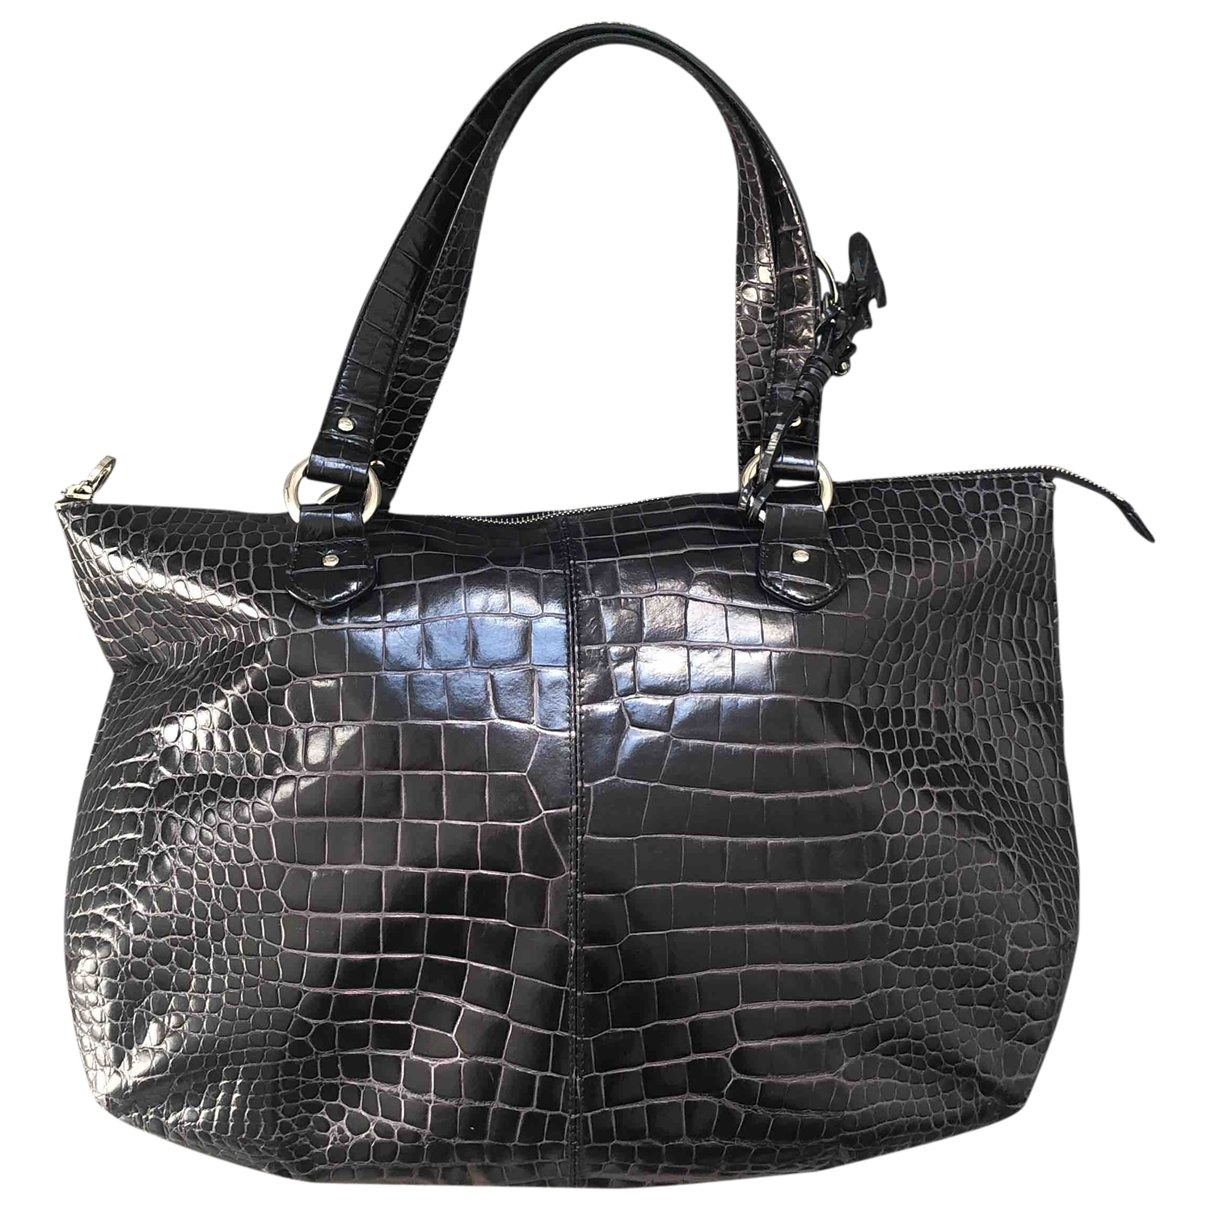 Oscar De La Renta \N Black Leather handbag for Women \N